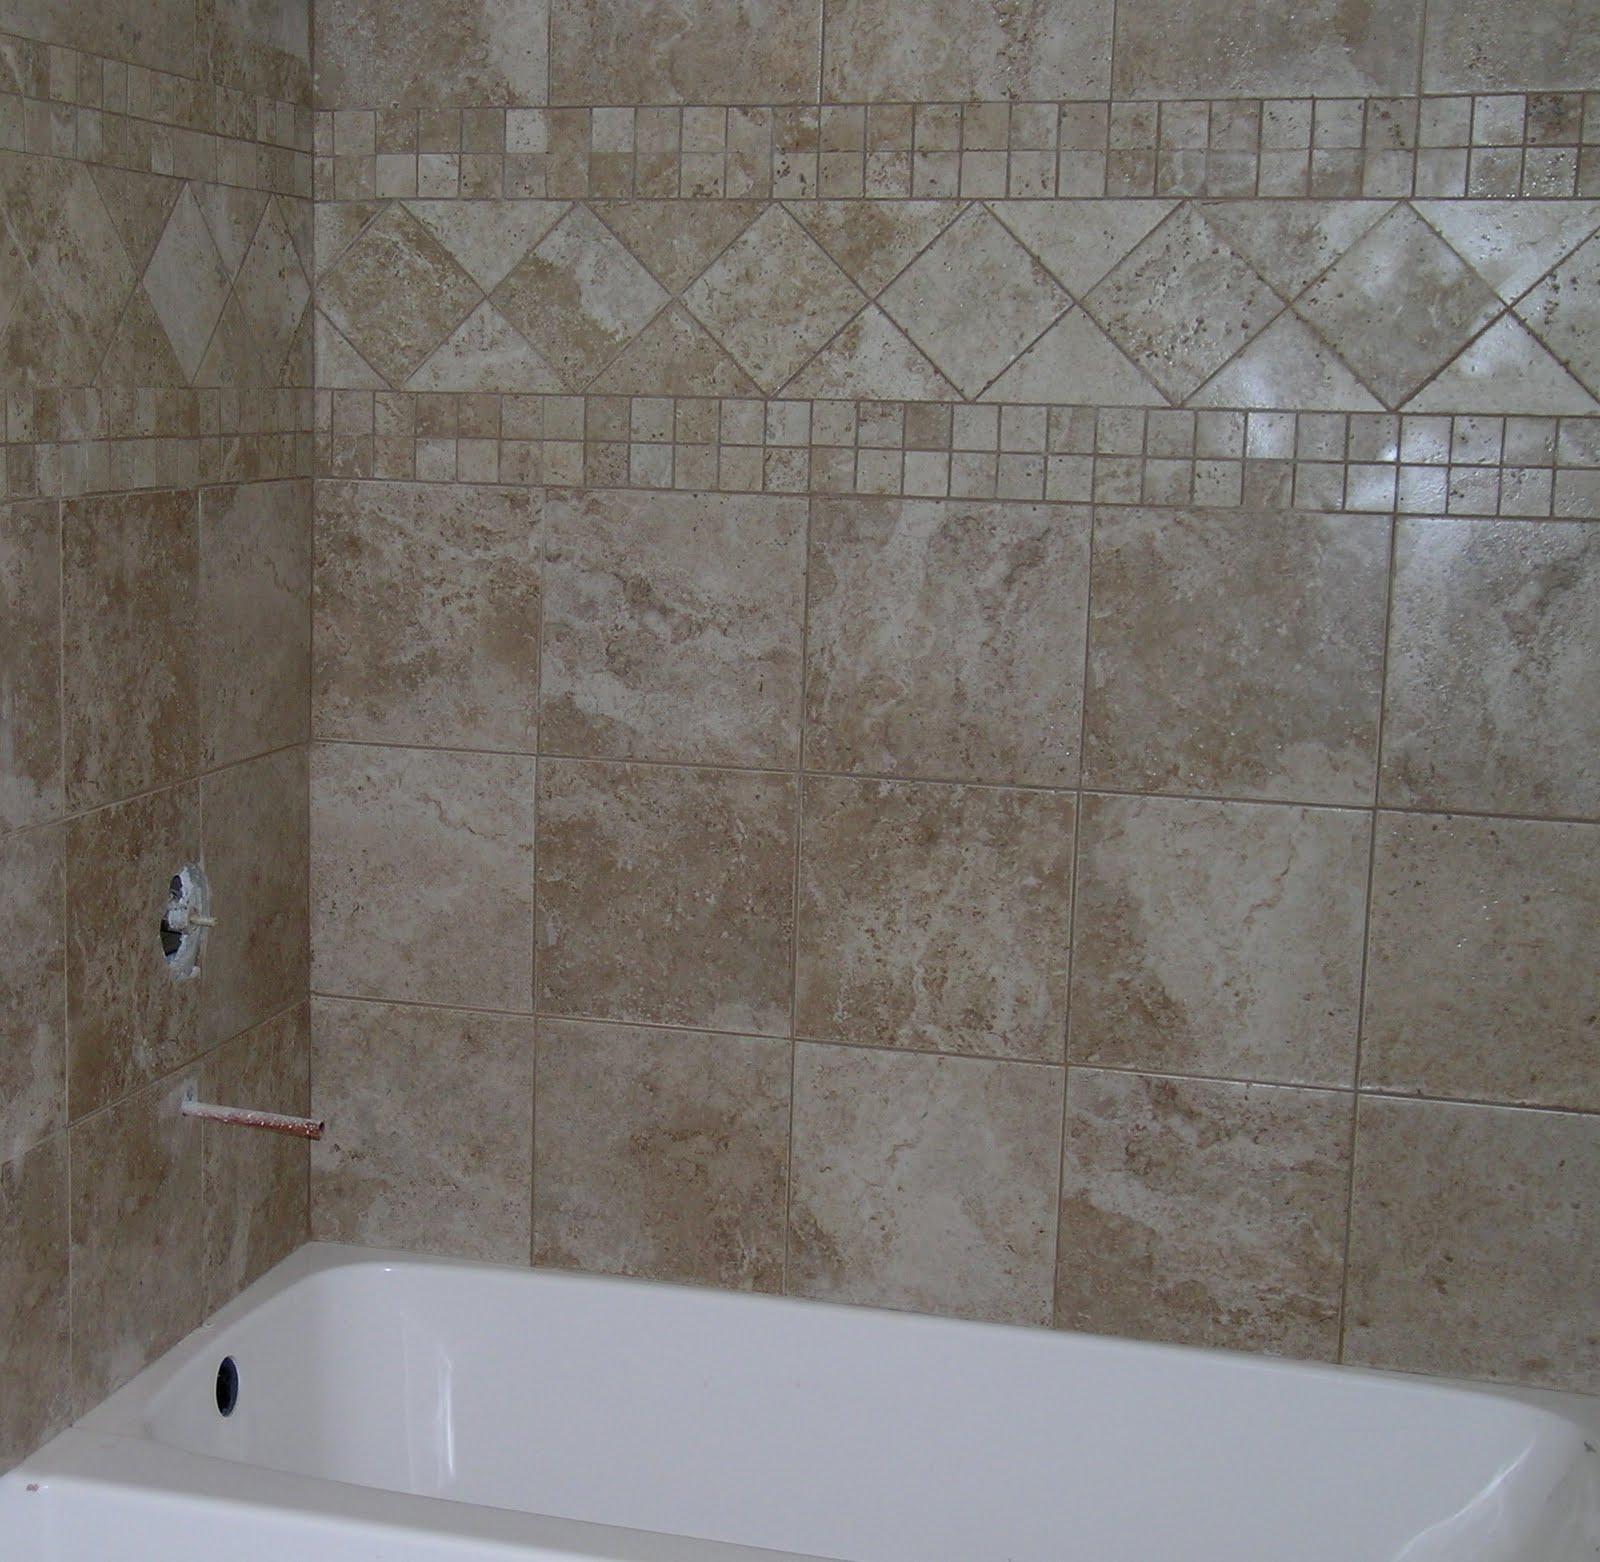 Porcelain Floor, Tile And Home